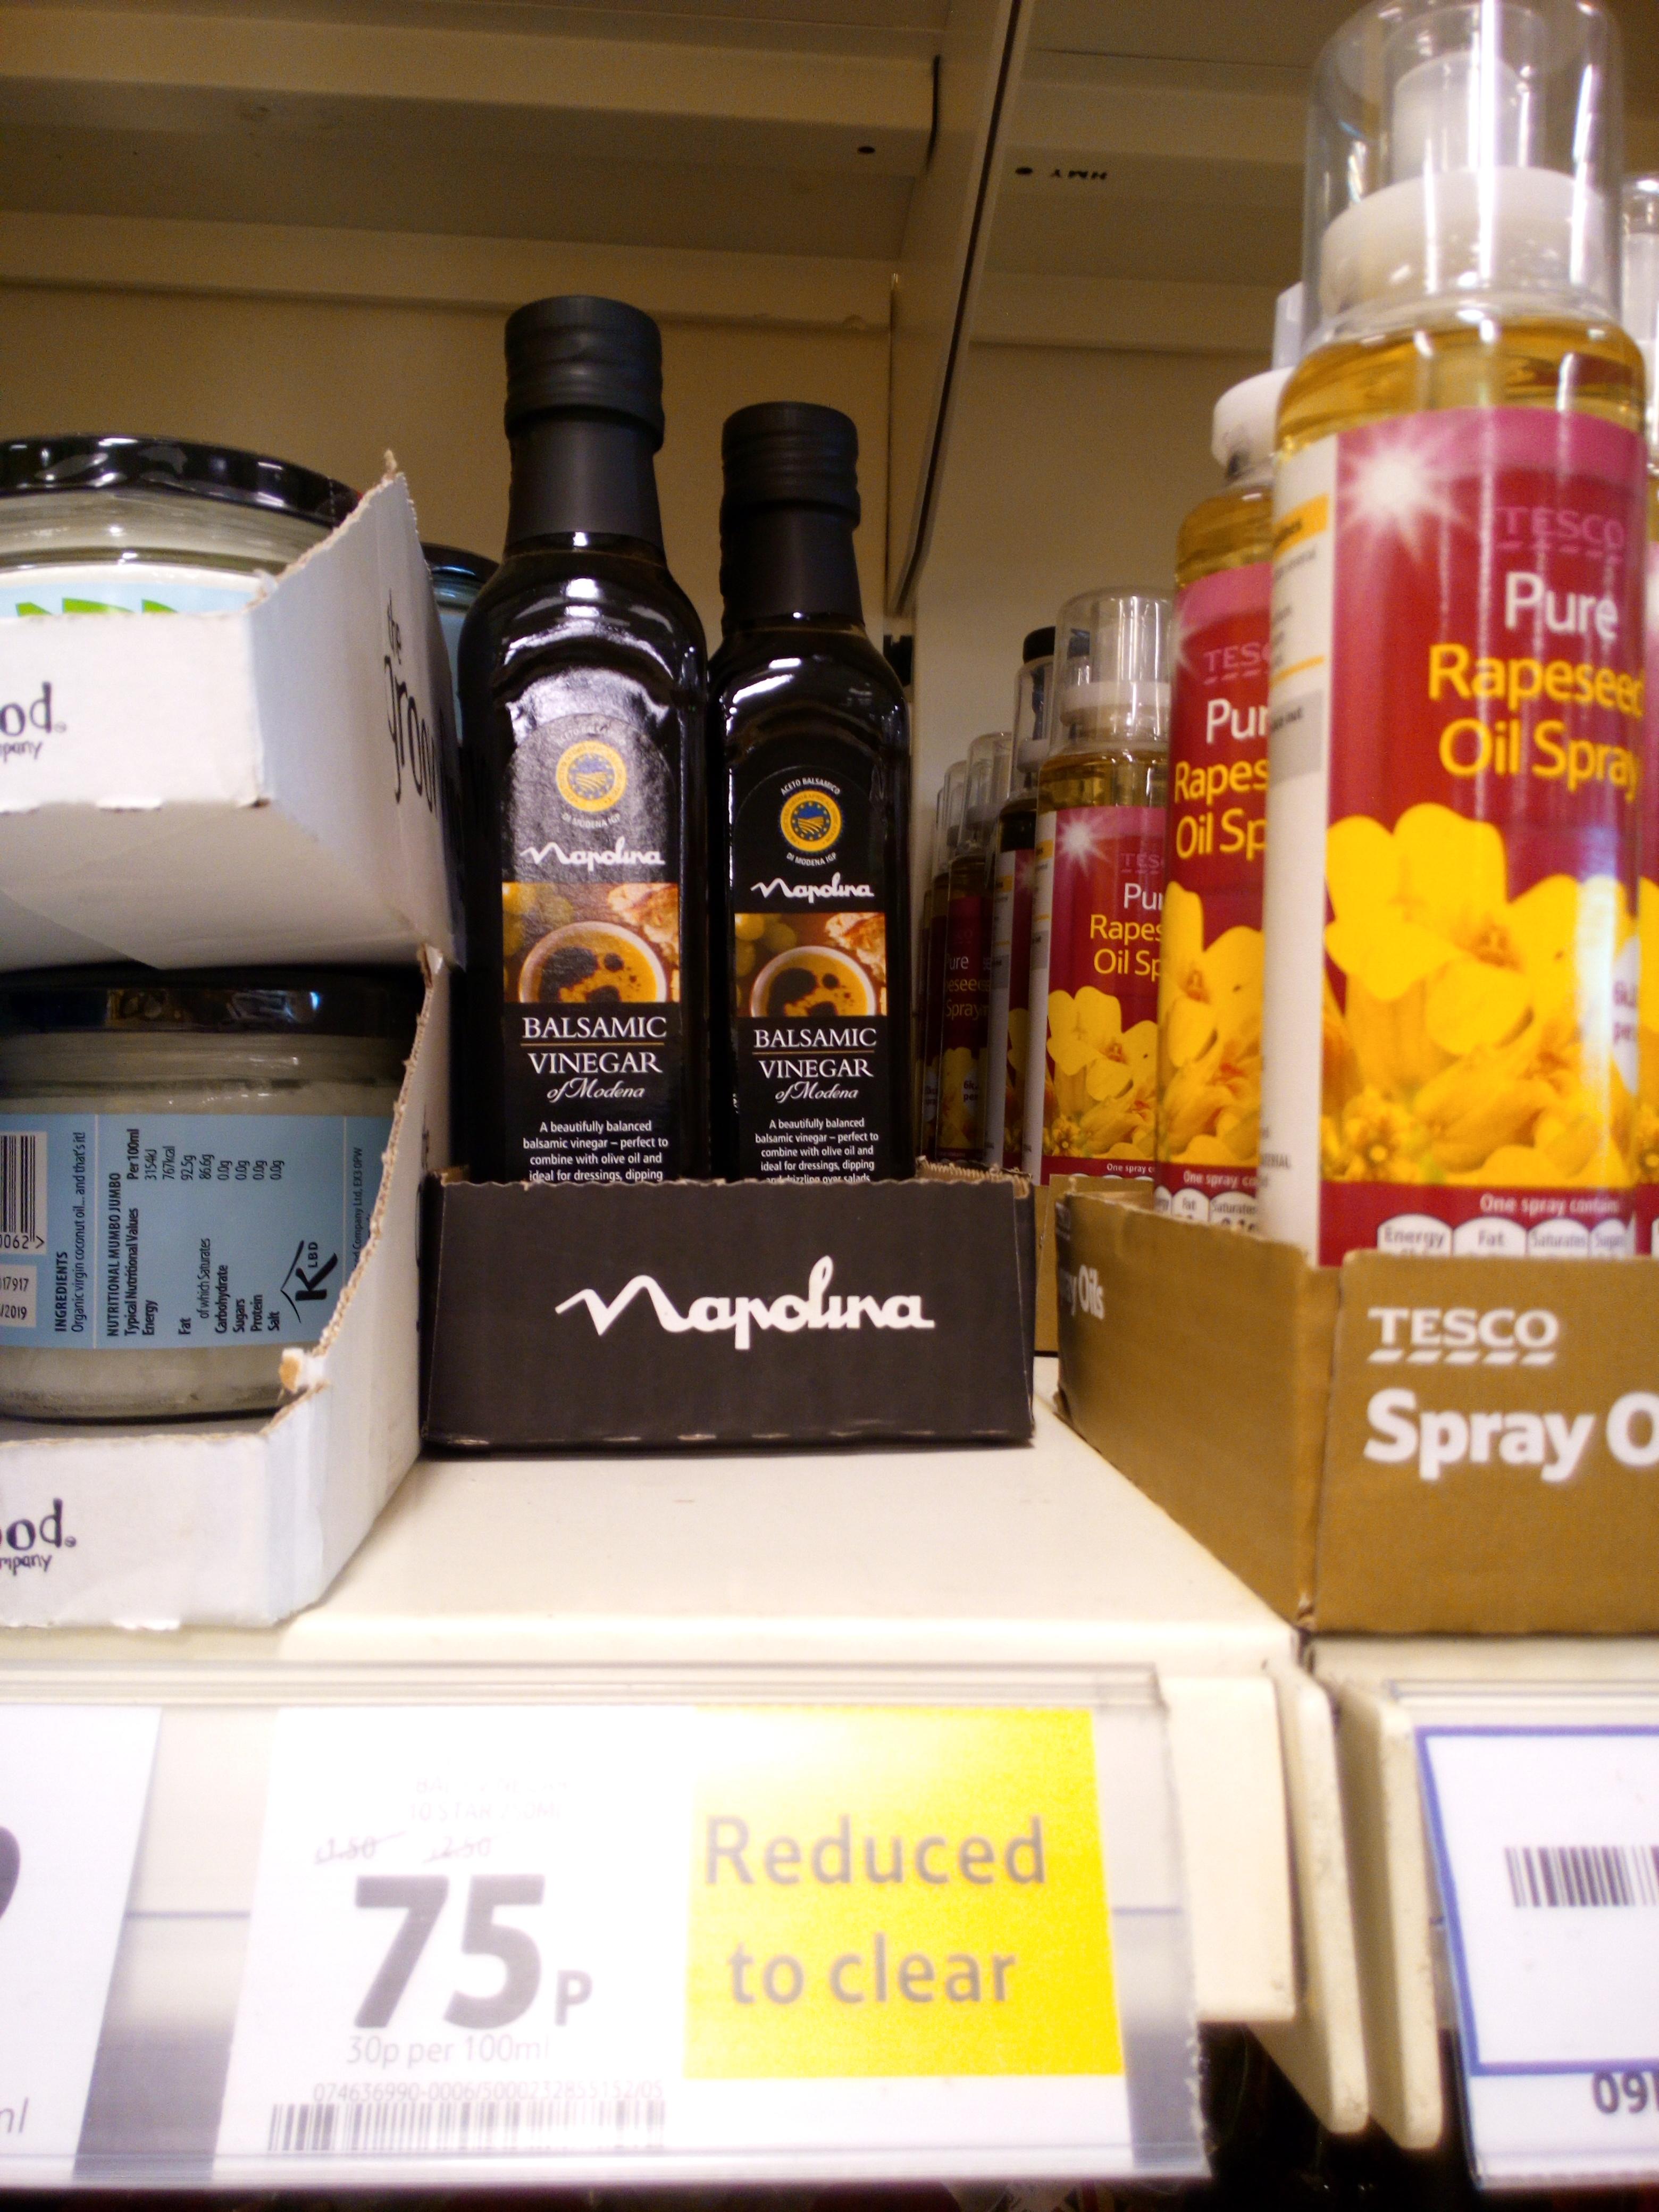 Napolina balsamic vinegar - 75p instore @ Tesco (Belfast)